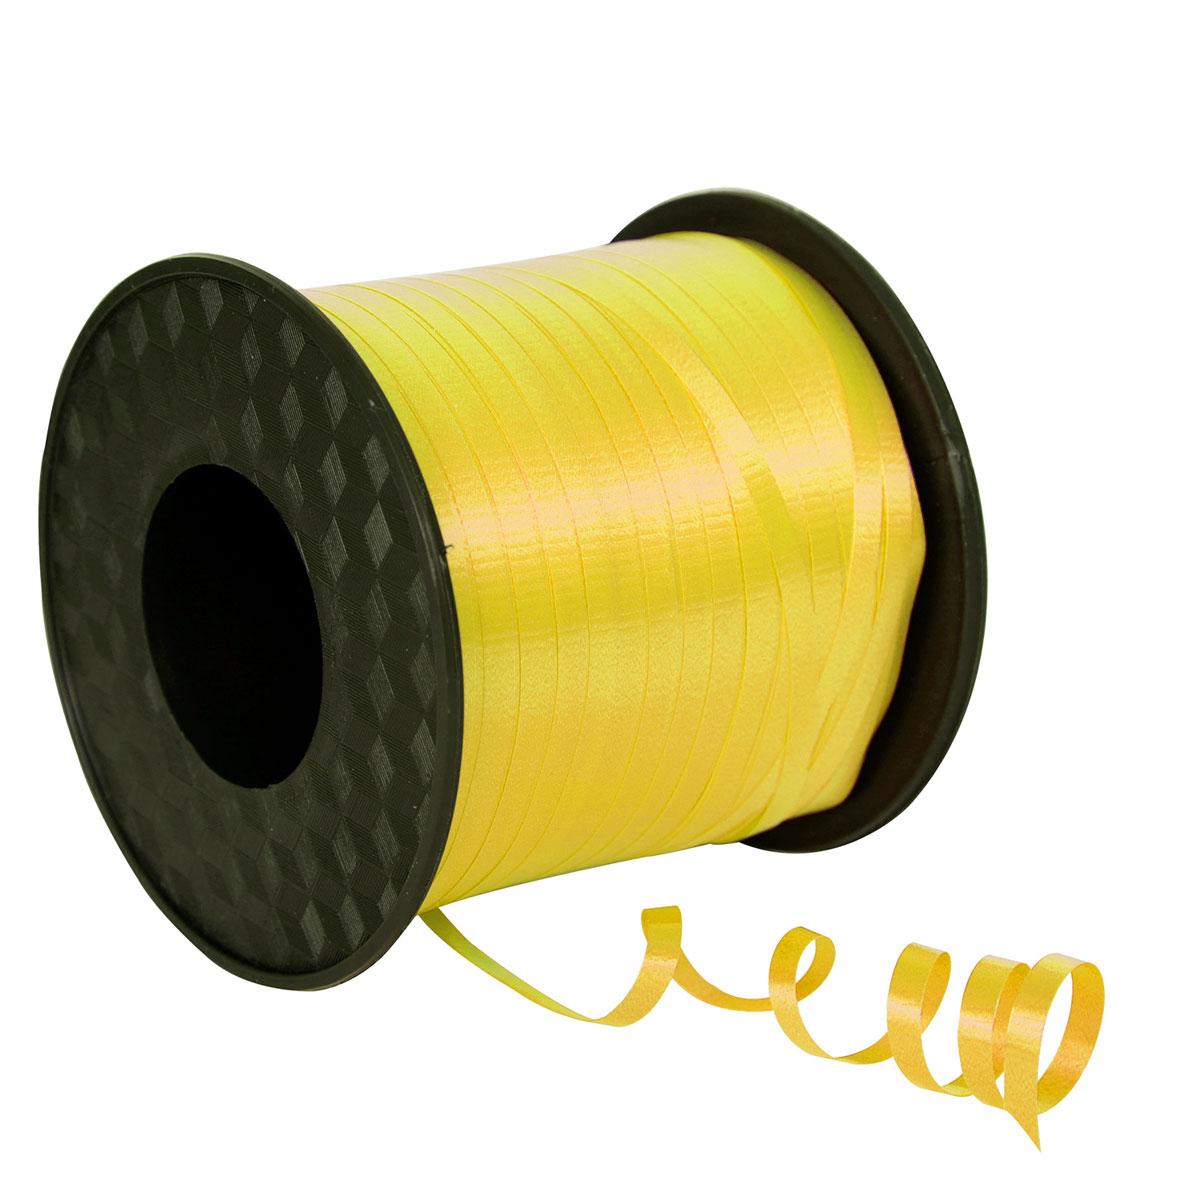 Ruban bolduc jaune or 500 m